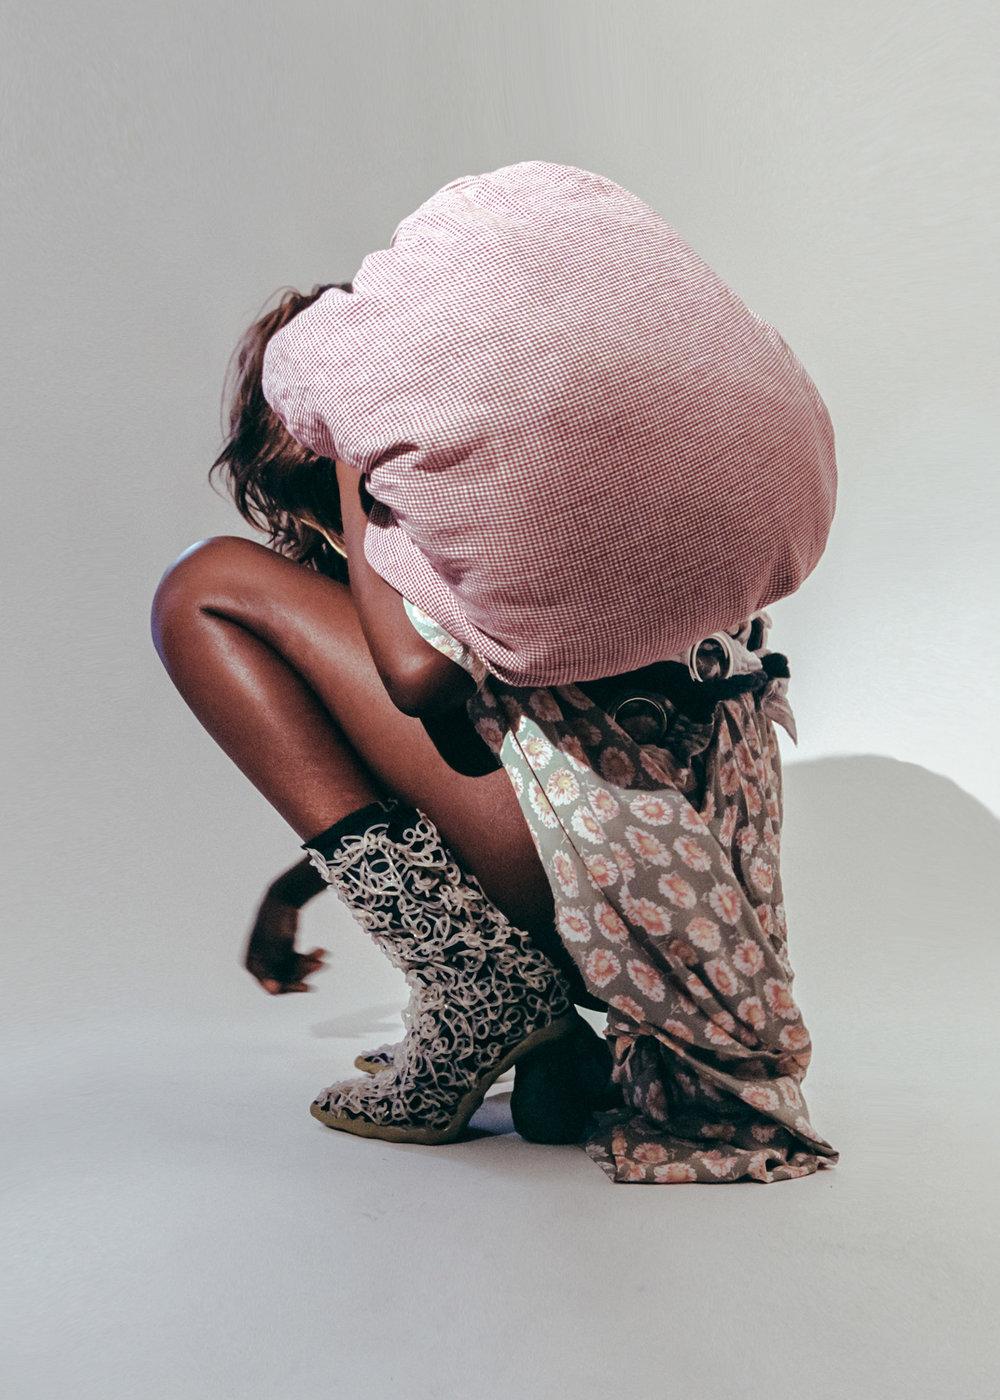 Alva Ilta Johansson dress, Jordan Dalah hat (worn as bag), Diane Gaignoux boots